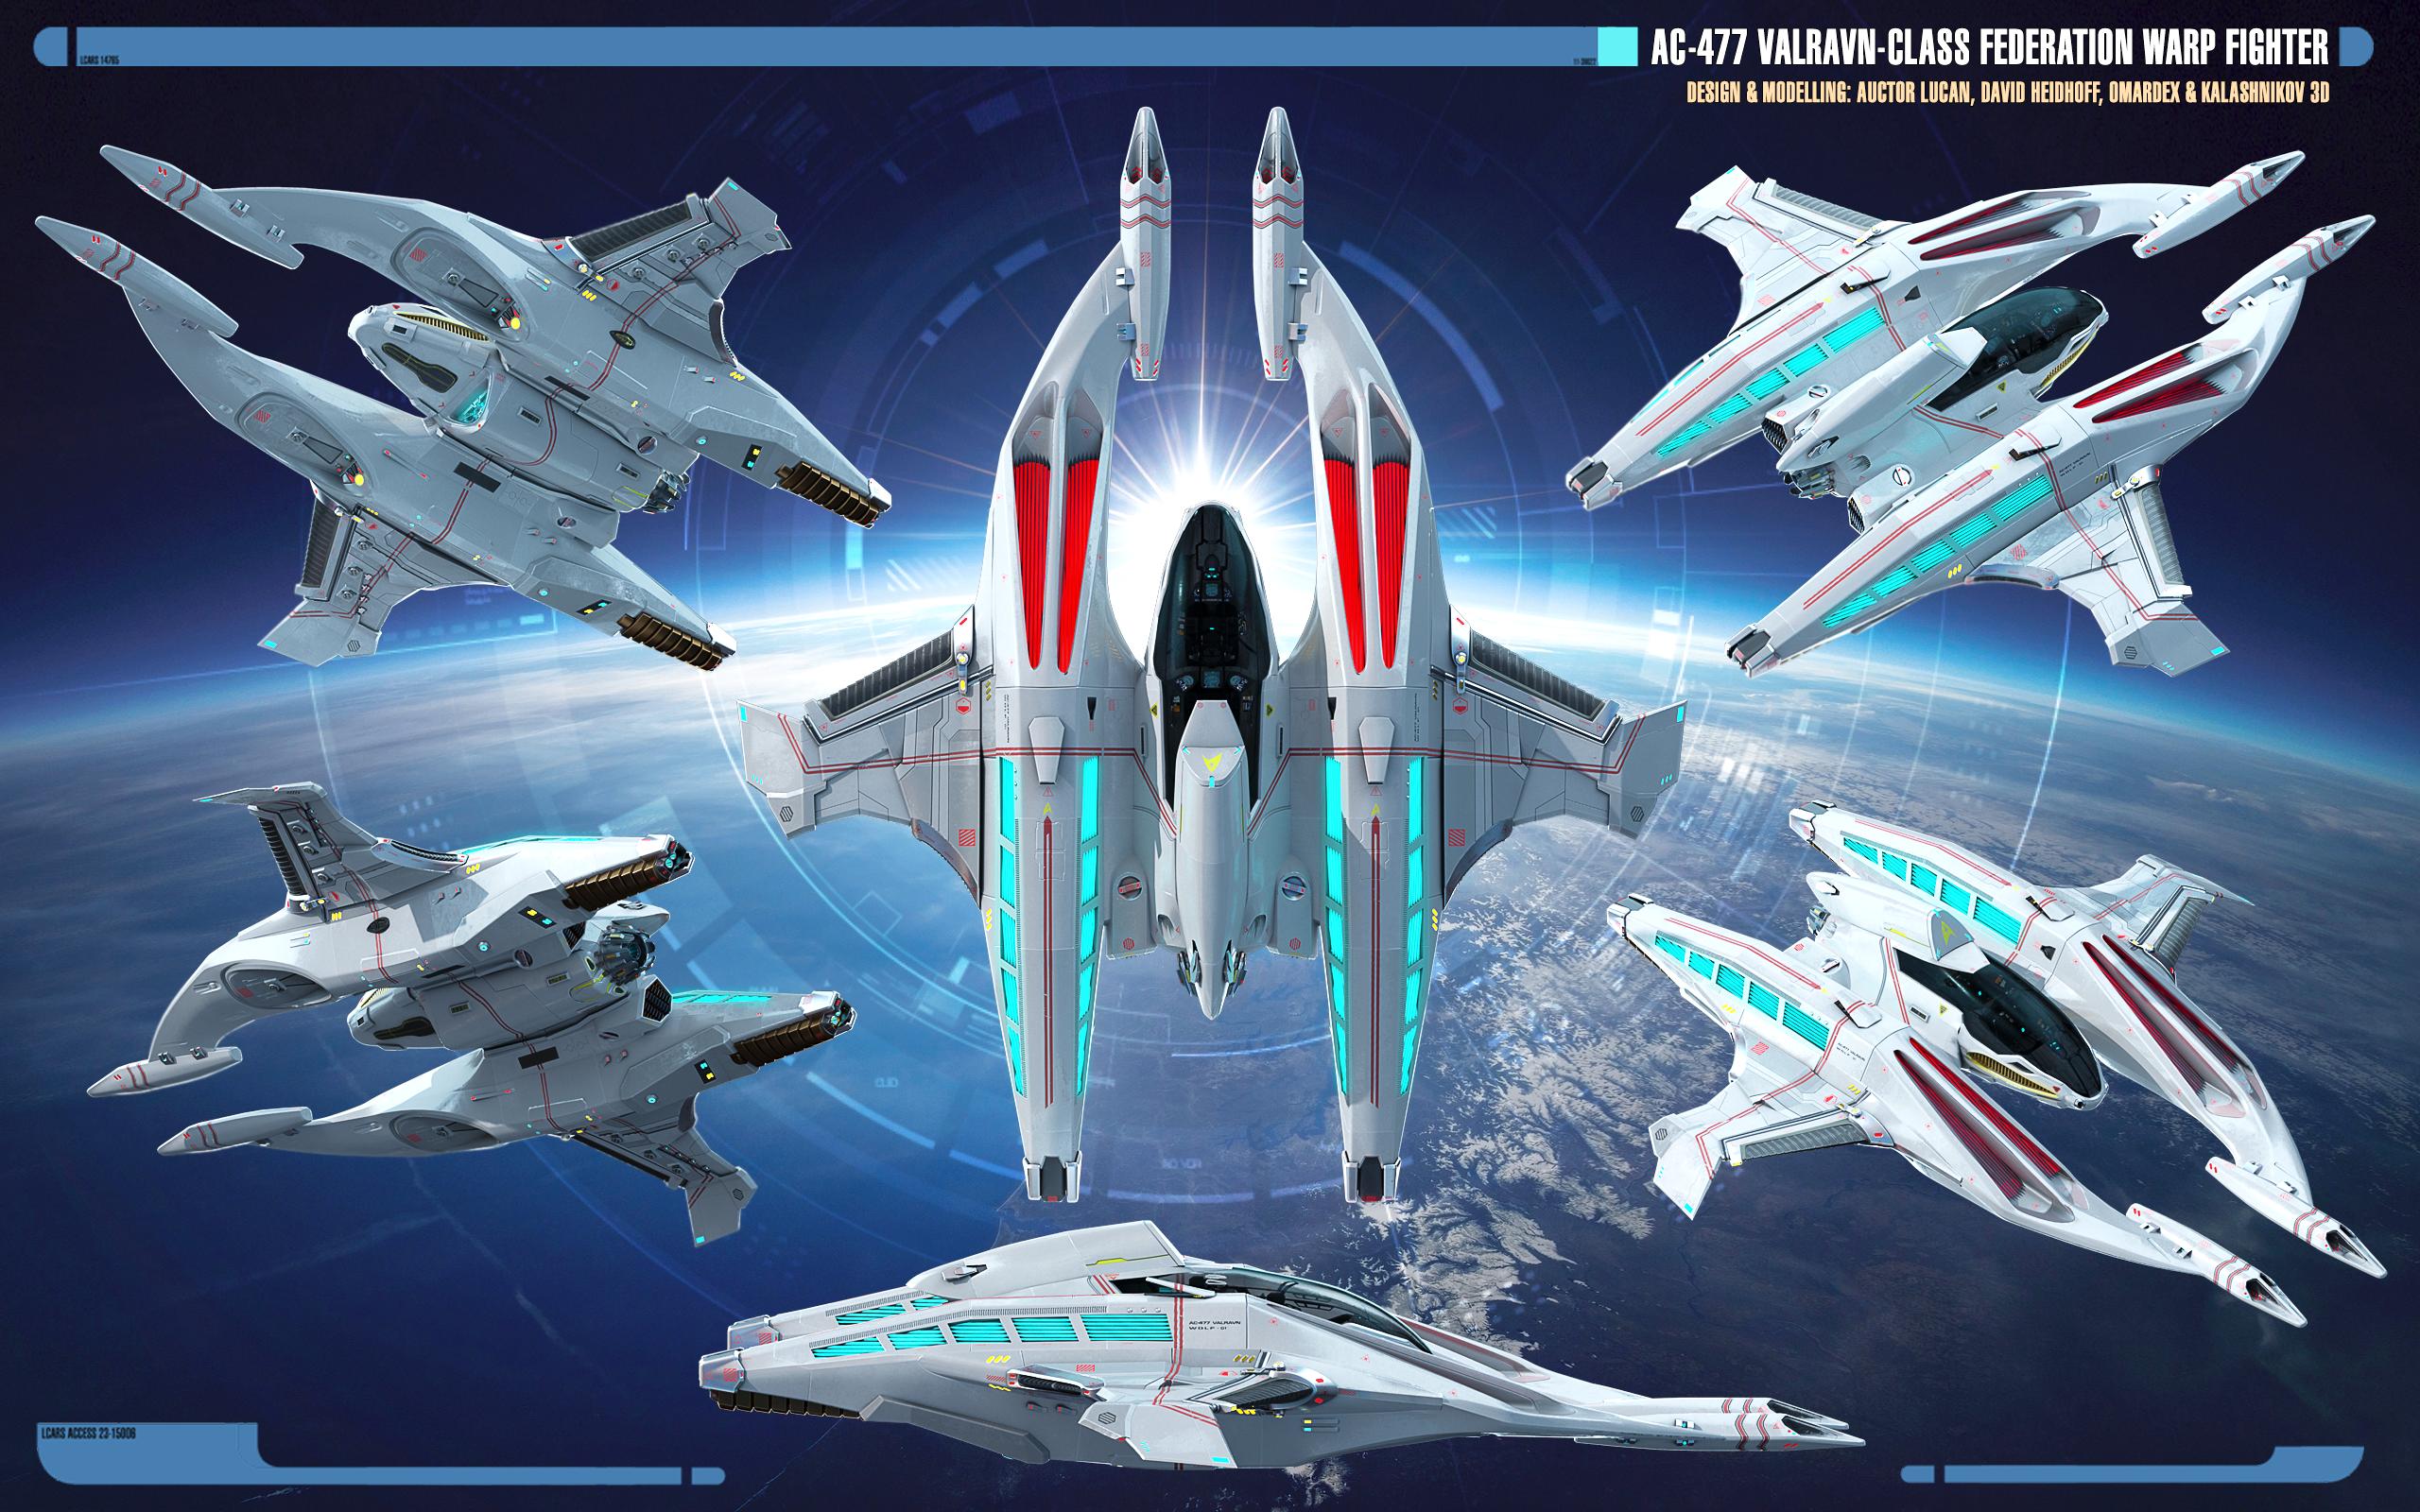 Fileoverview Ac 477 Valravn Class Warp Fighterpng Star Trek